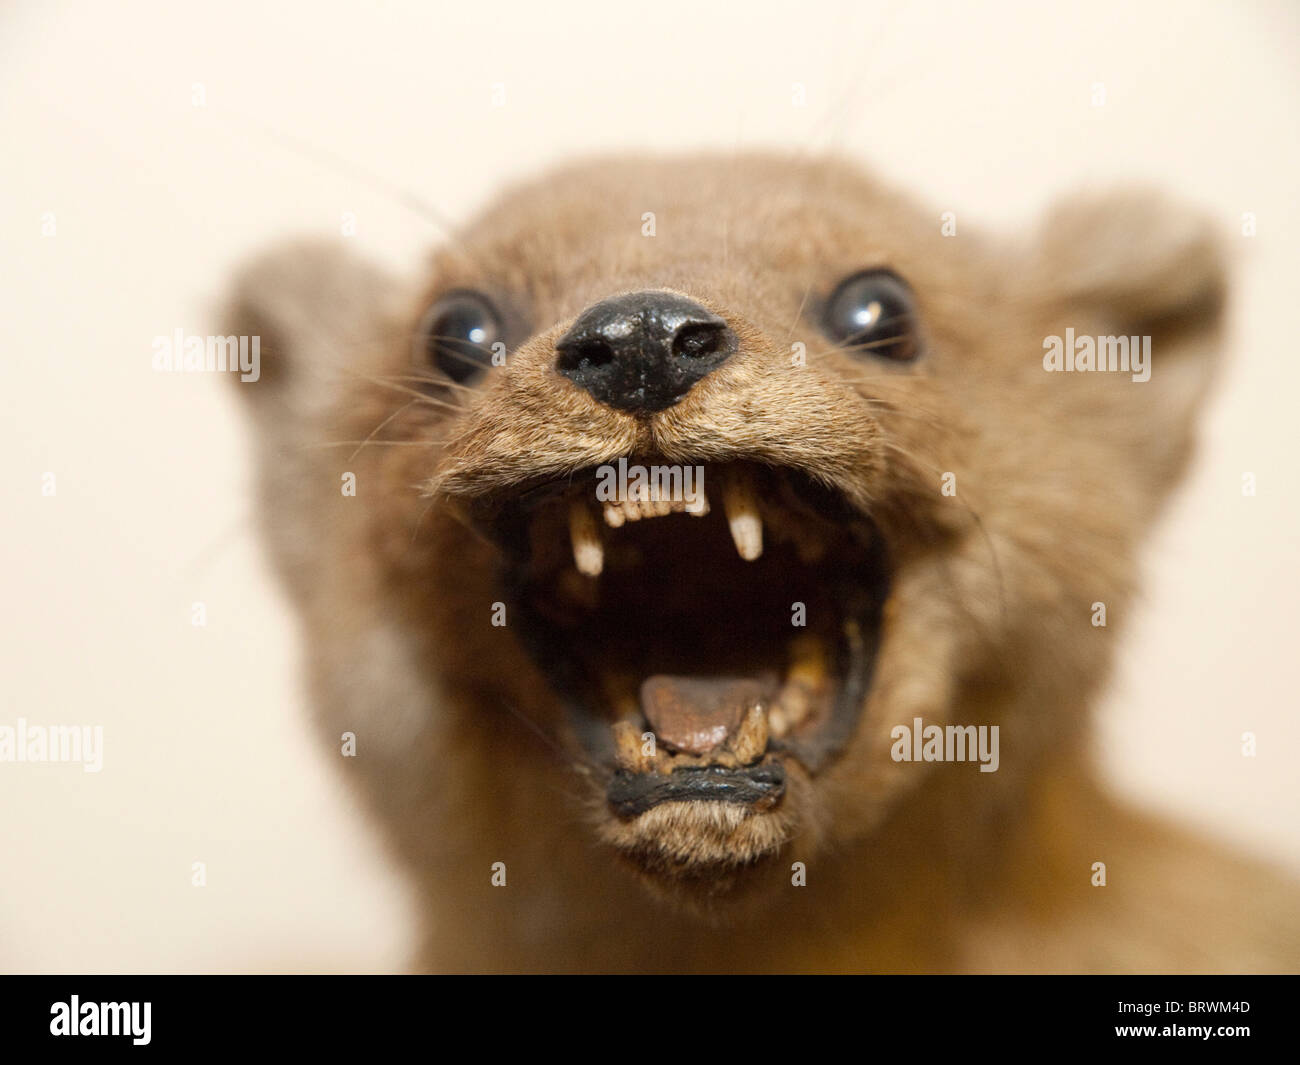 a stuffed animal taxidermy stock photo 31912061 alamy